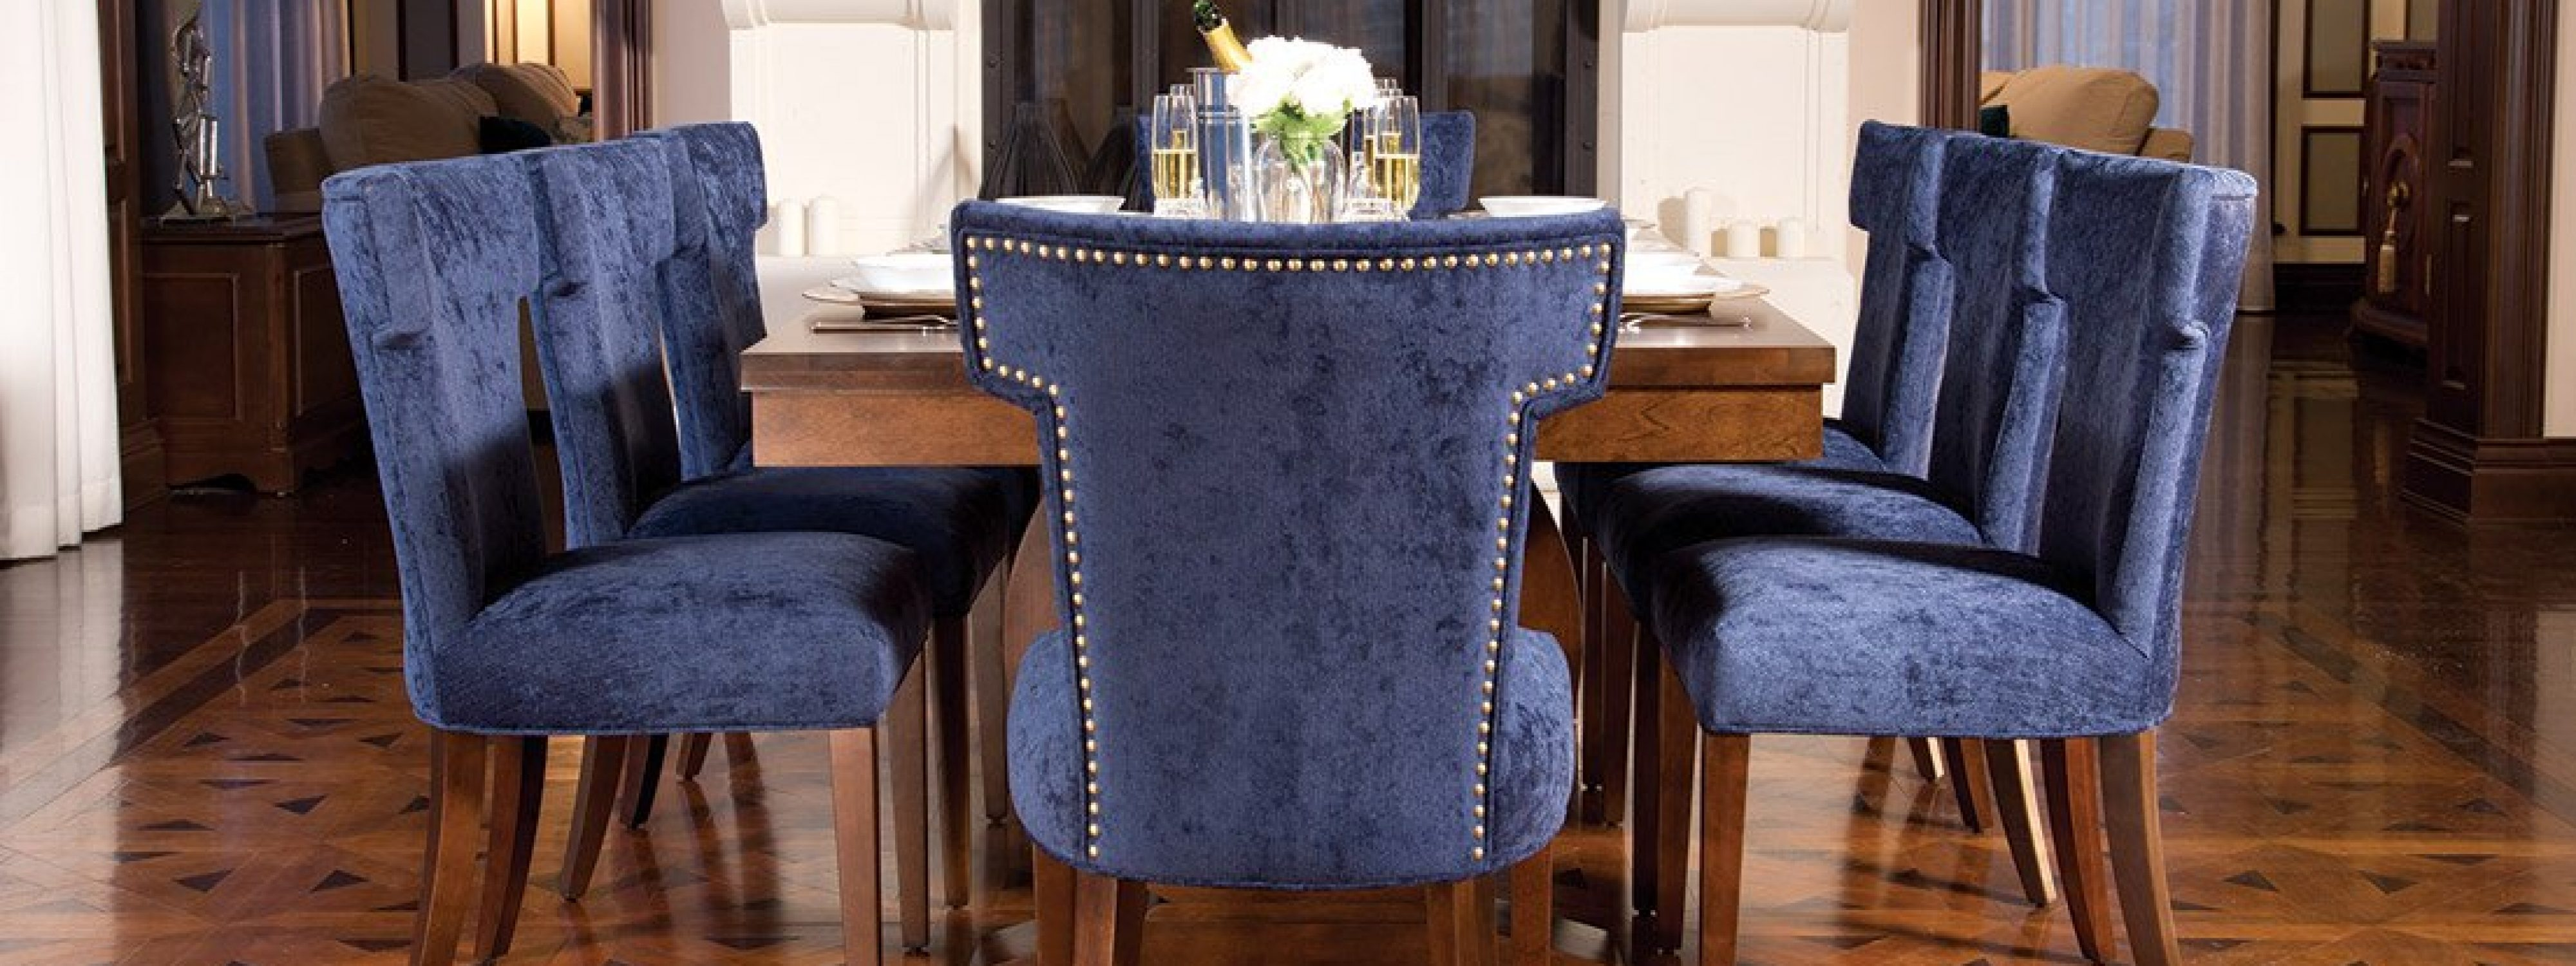 Denali Table & Chairs CB1523 : CB1723 by Bertanie